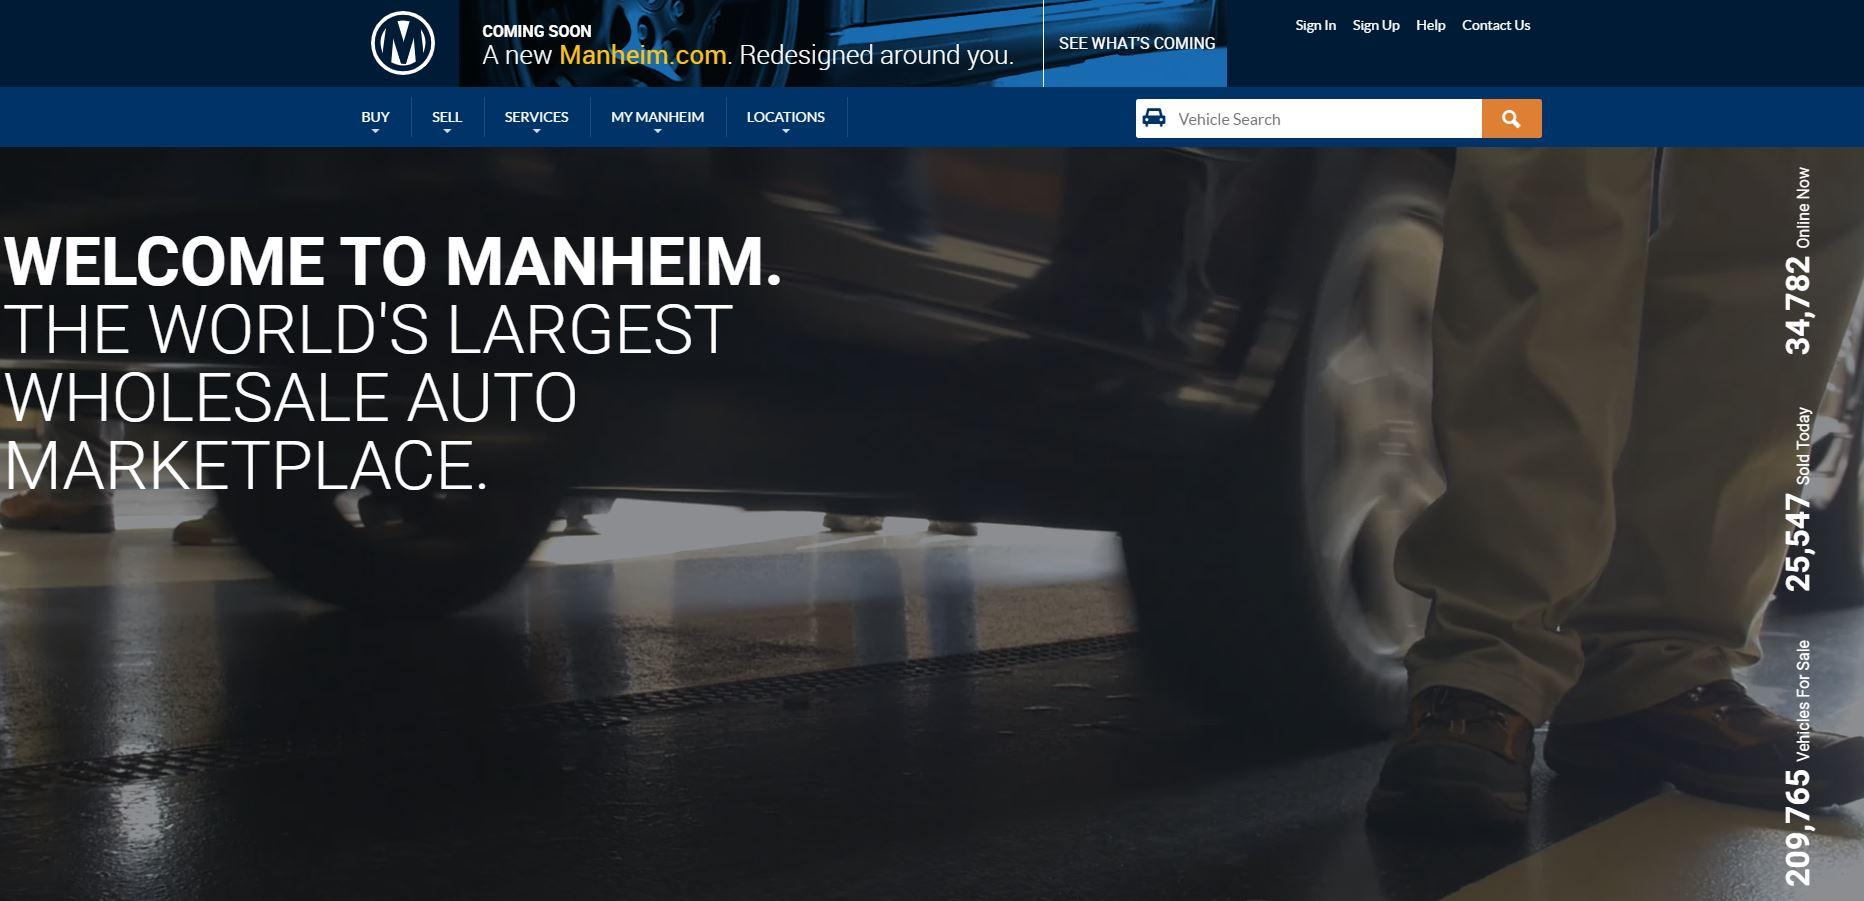 Manheim Introduces New Website